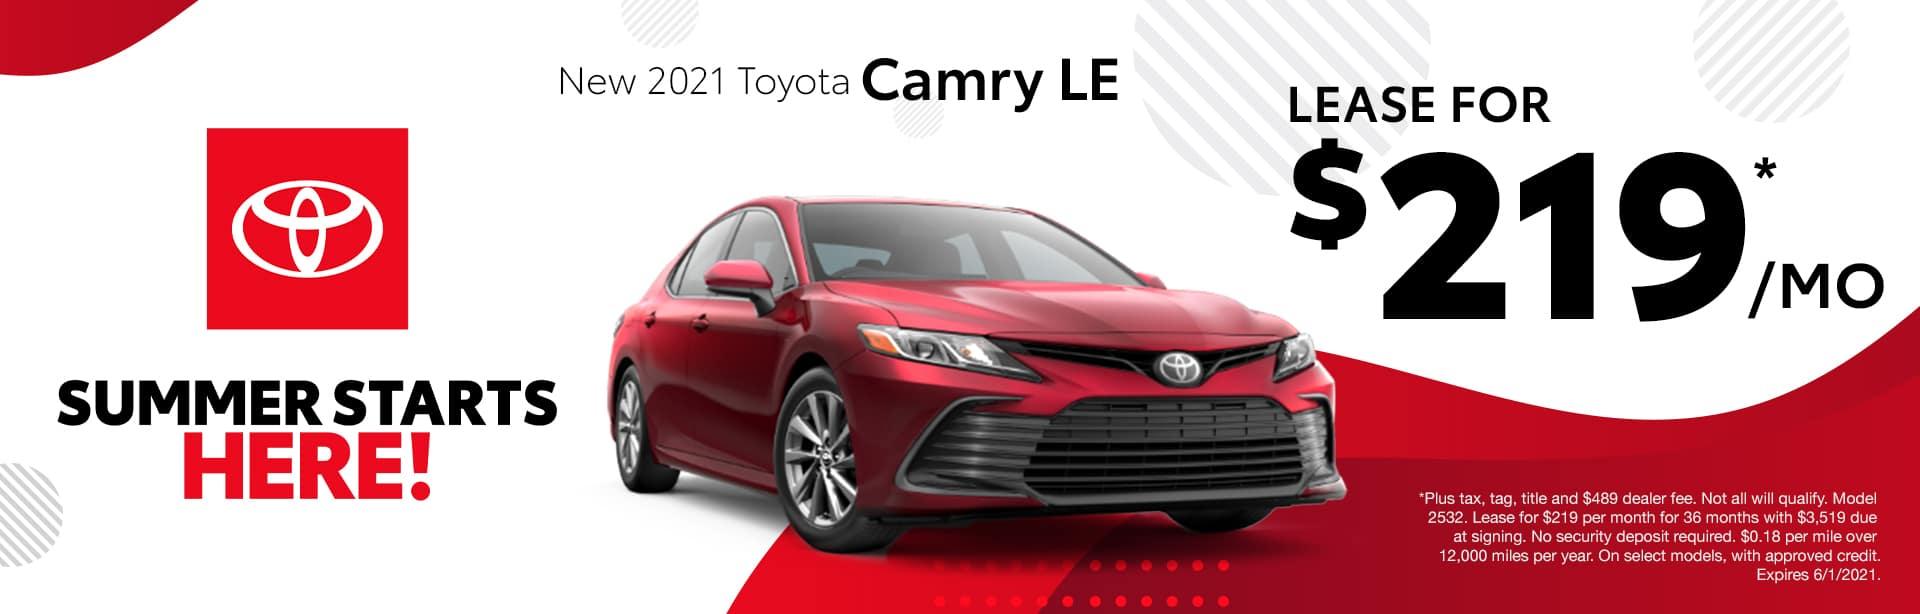 New 2021 Toyota Camry Albertville AL